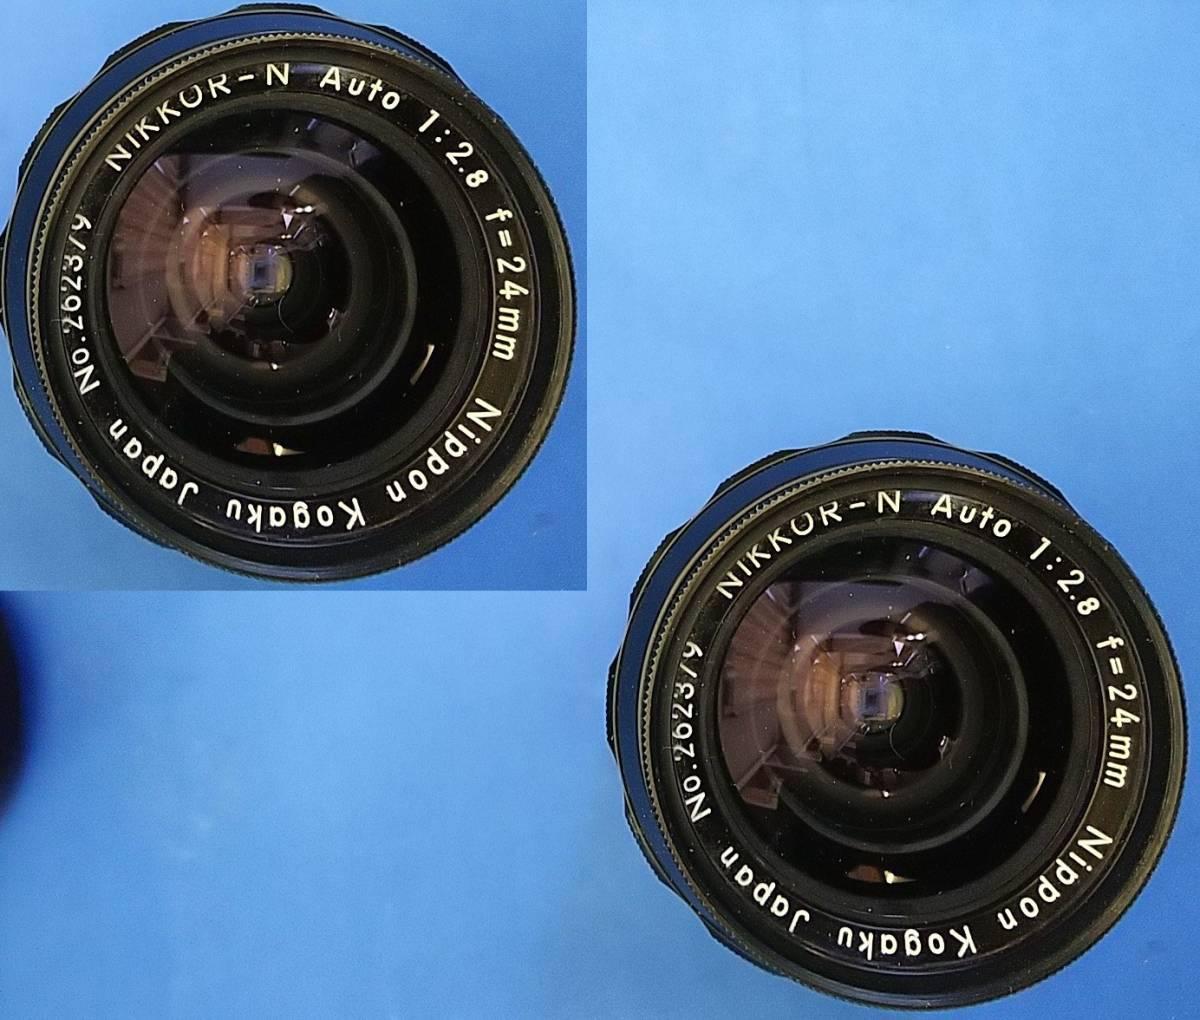 Nikon ニコン F ボディ+24mm 50mm 55mm 86mm 105mm 135mm 80~200mm 300mm等 レンズ多数 _画像9